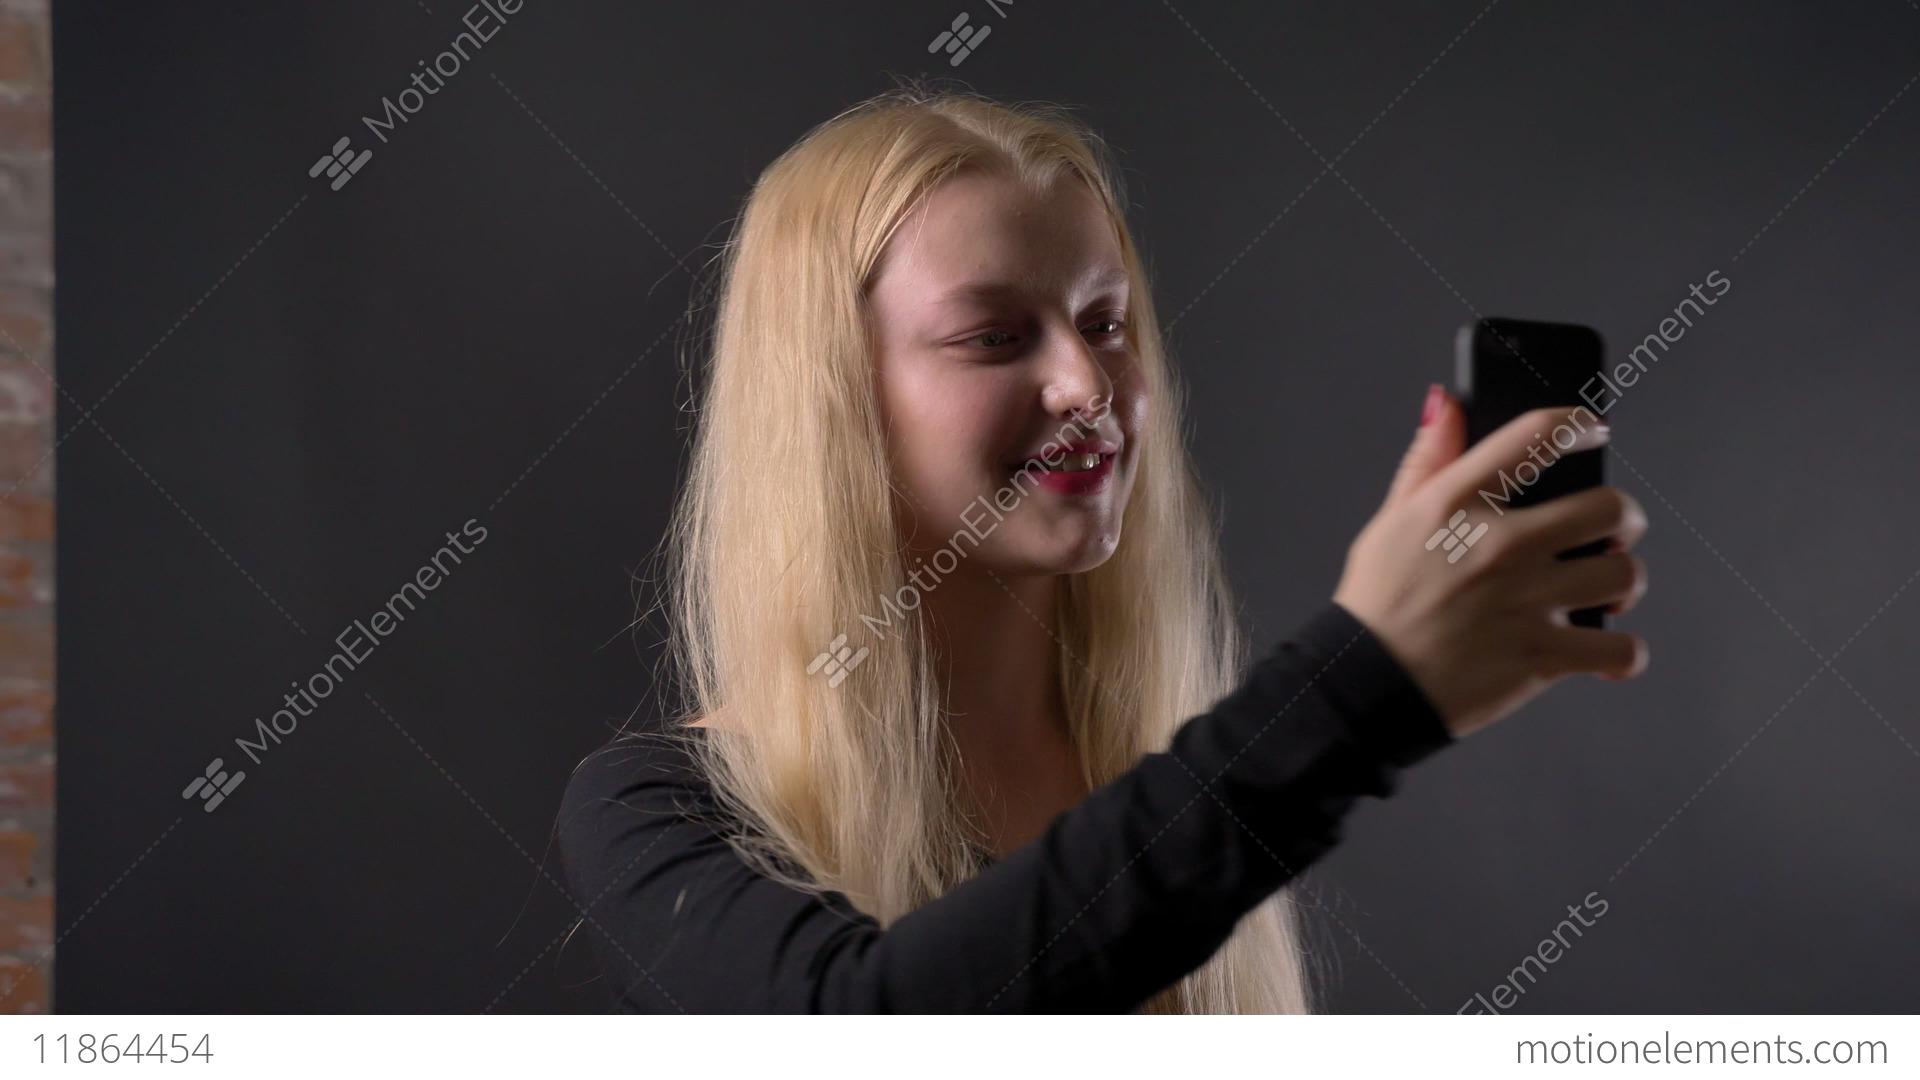 Hot amatuer teen pics